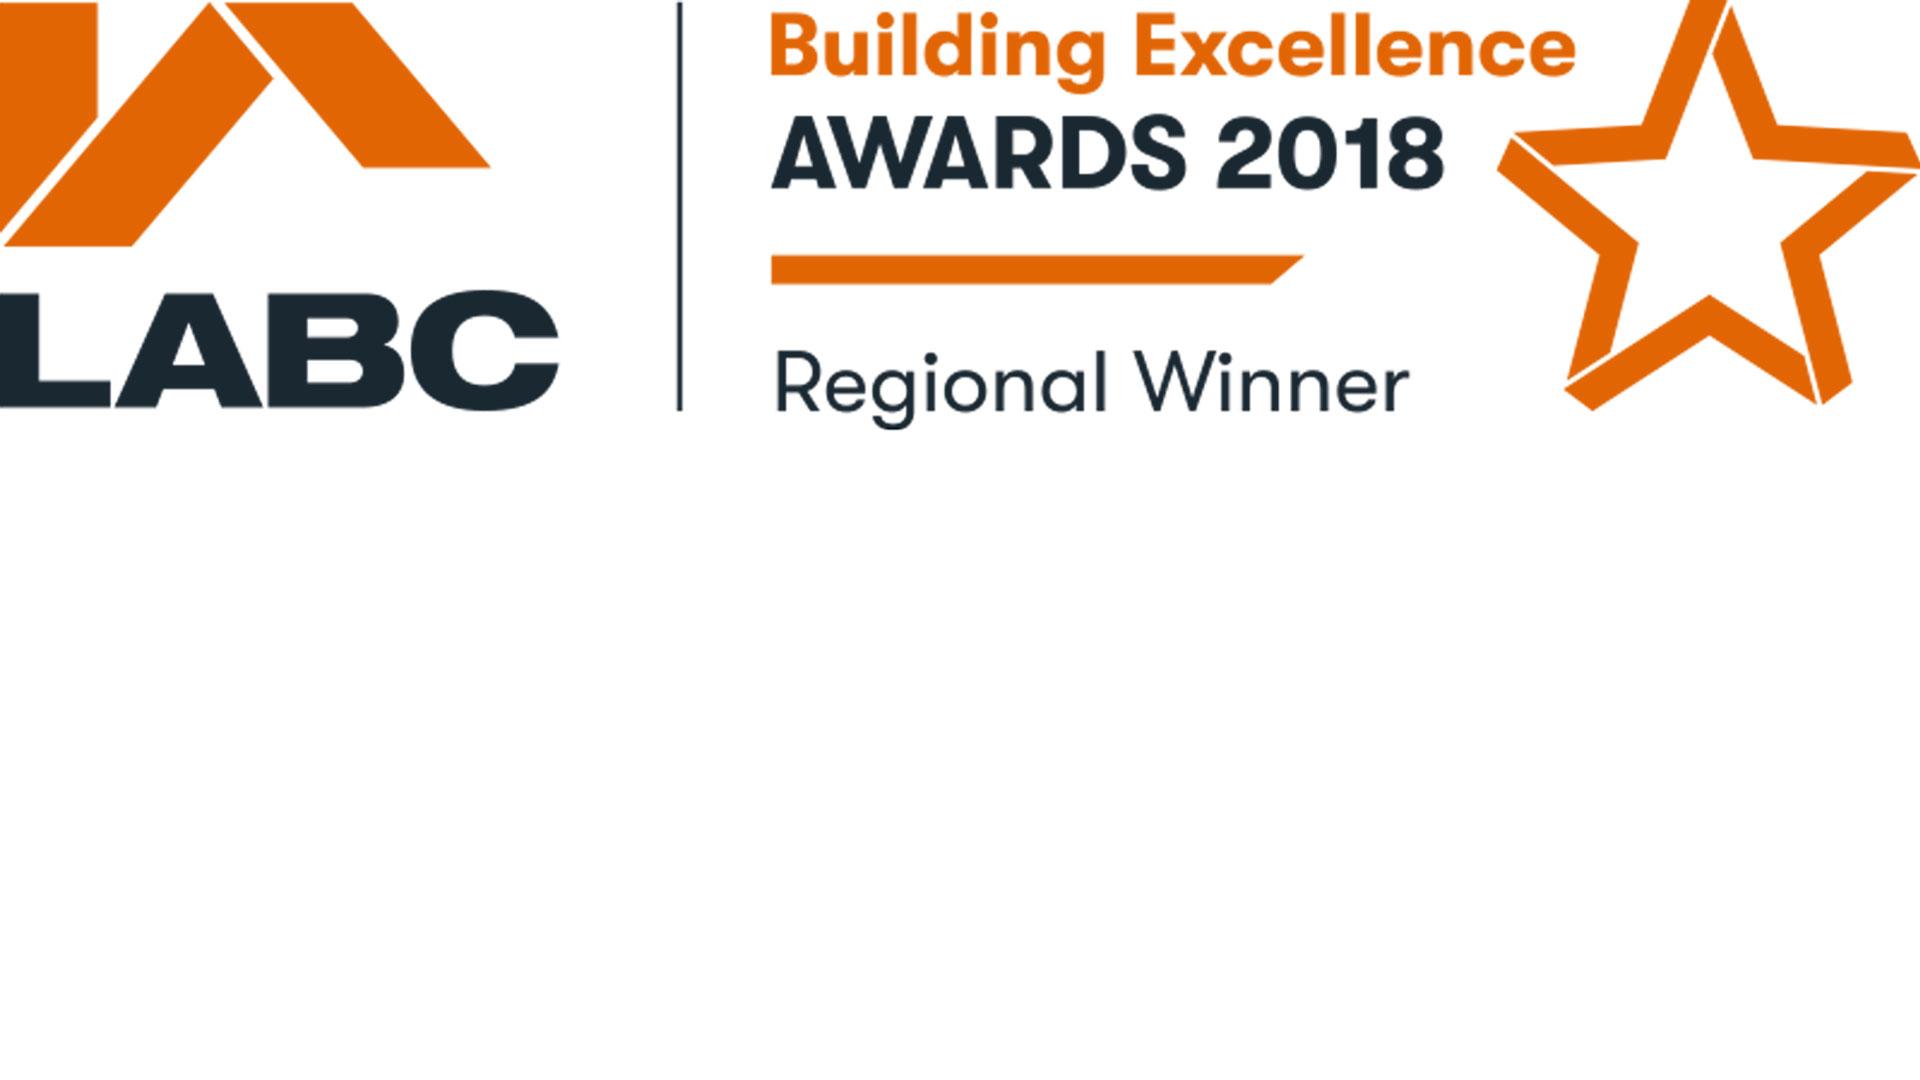 LABC Award Success